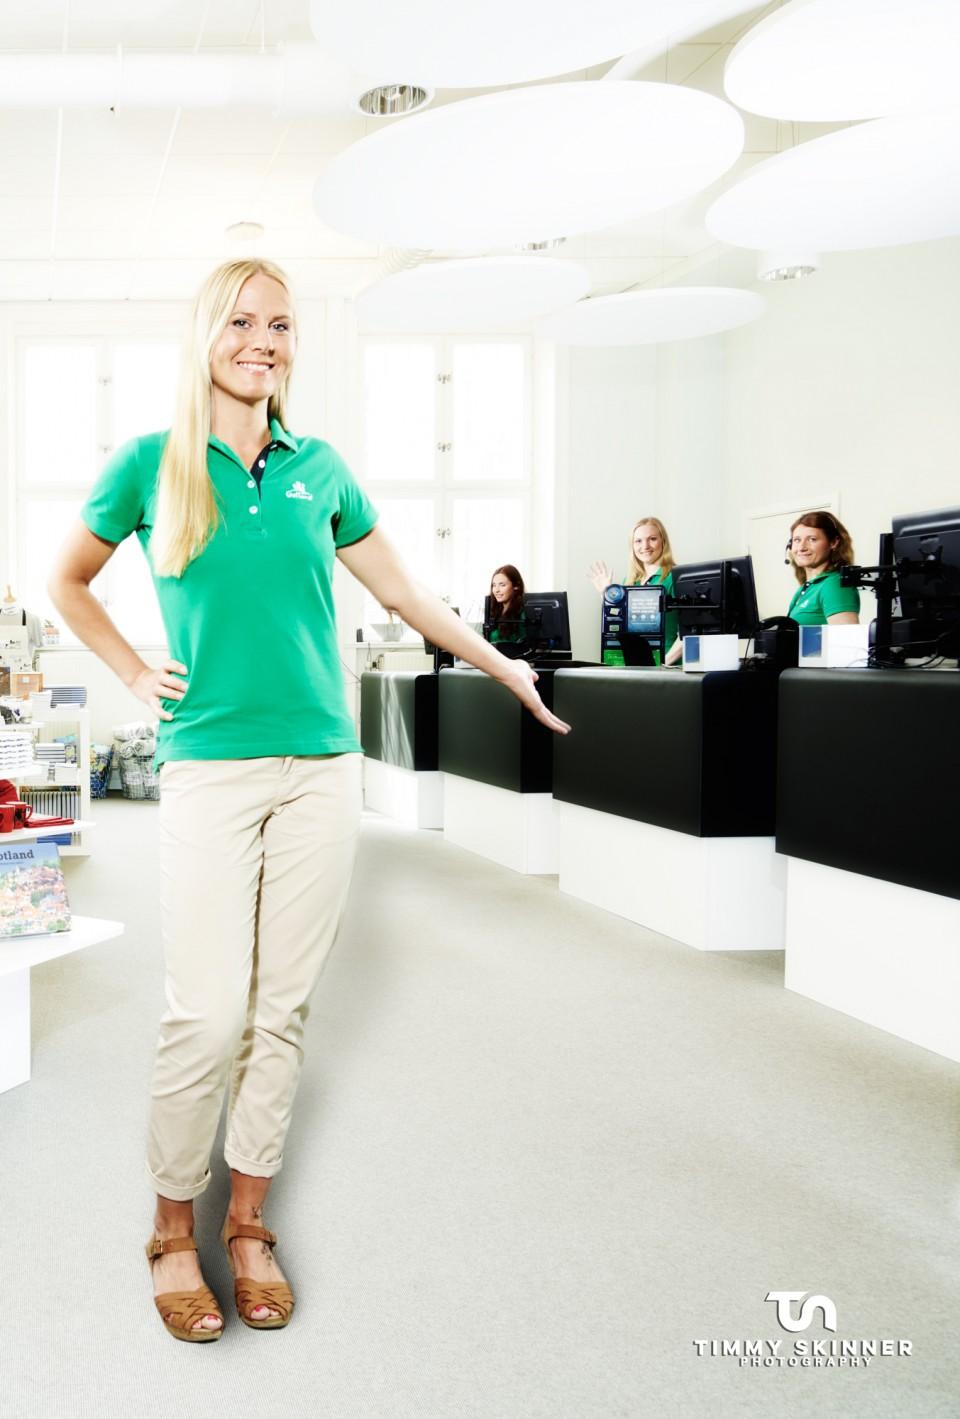 Official visitors bureau Gotland